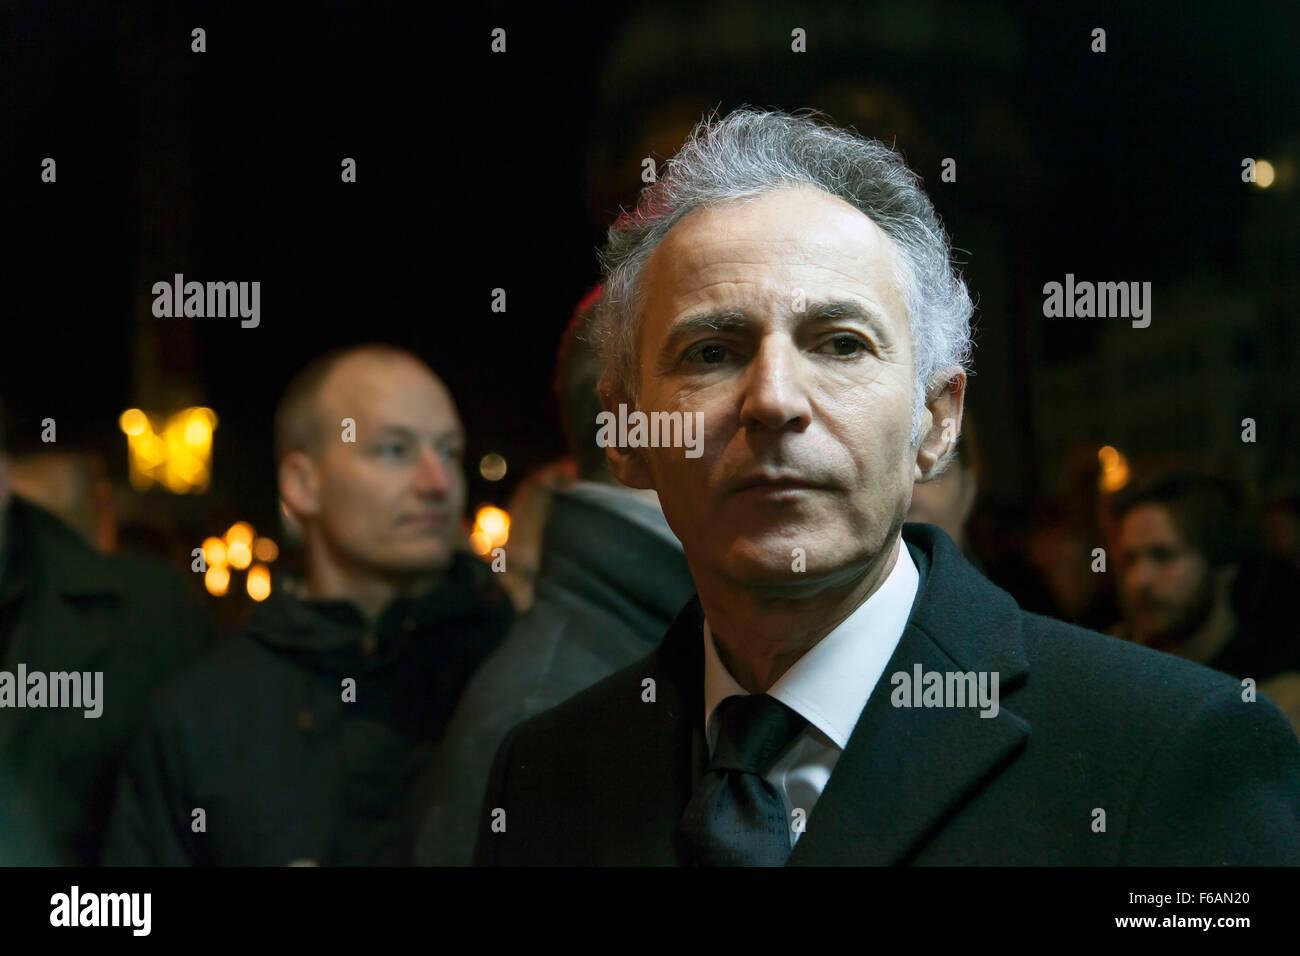 Copenhagen, Danimarca. 15 Novembre, 2015. Ambasciatore francese in Danimarca, François Zimeray, partecipa alla Immagini Stock